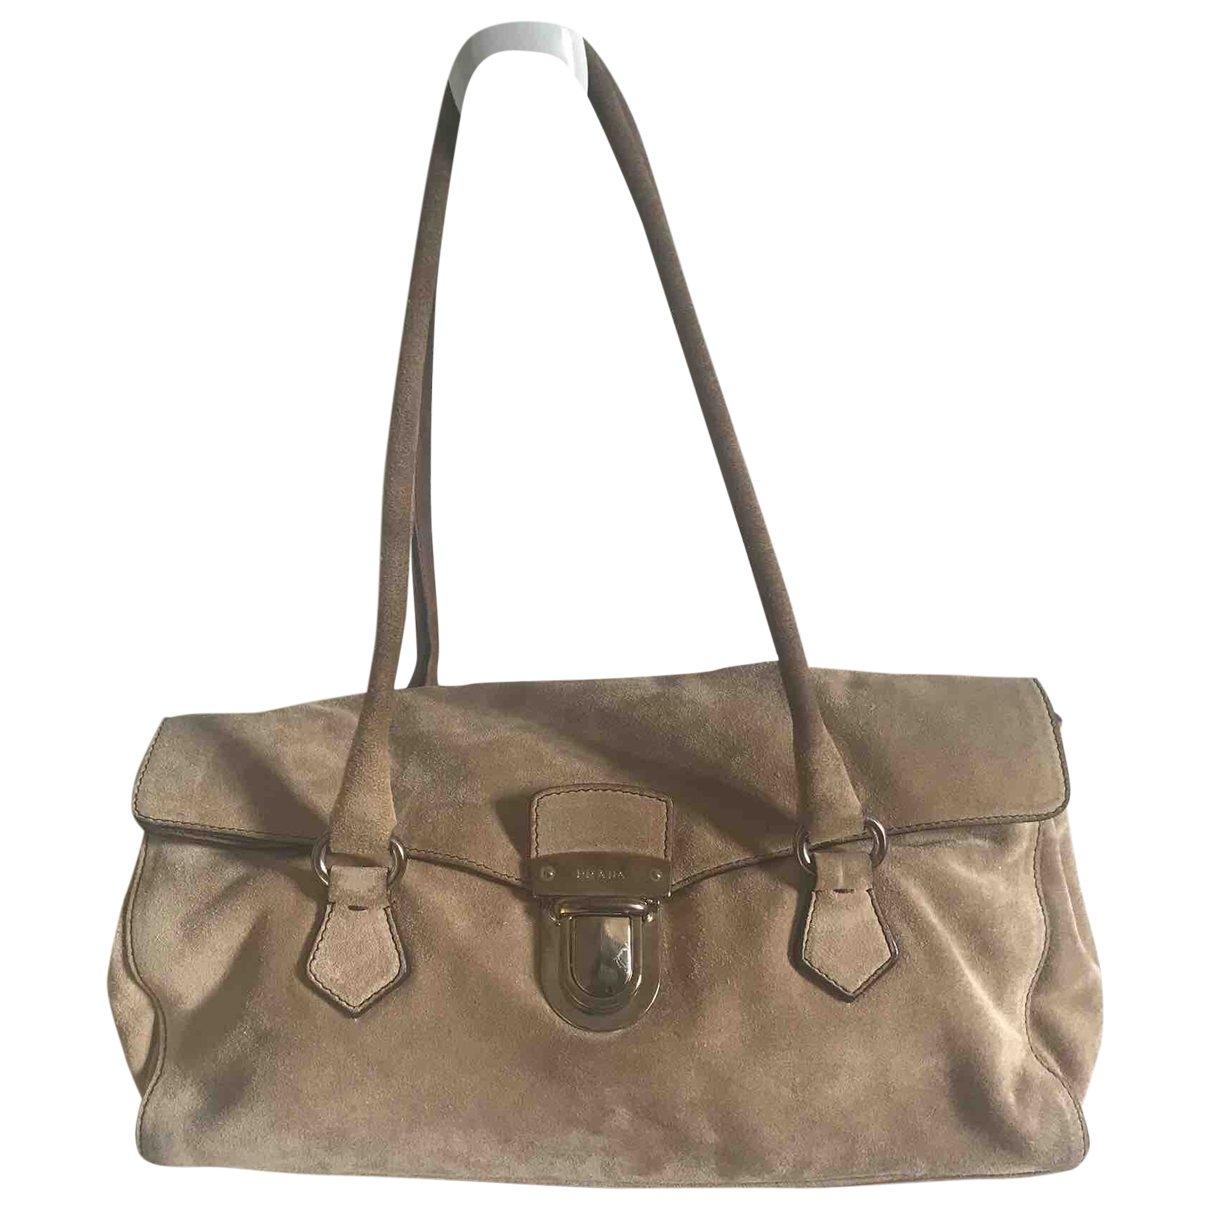 Prada \N Handtasche in  Beige Veloursleder